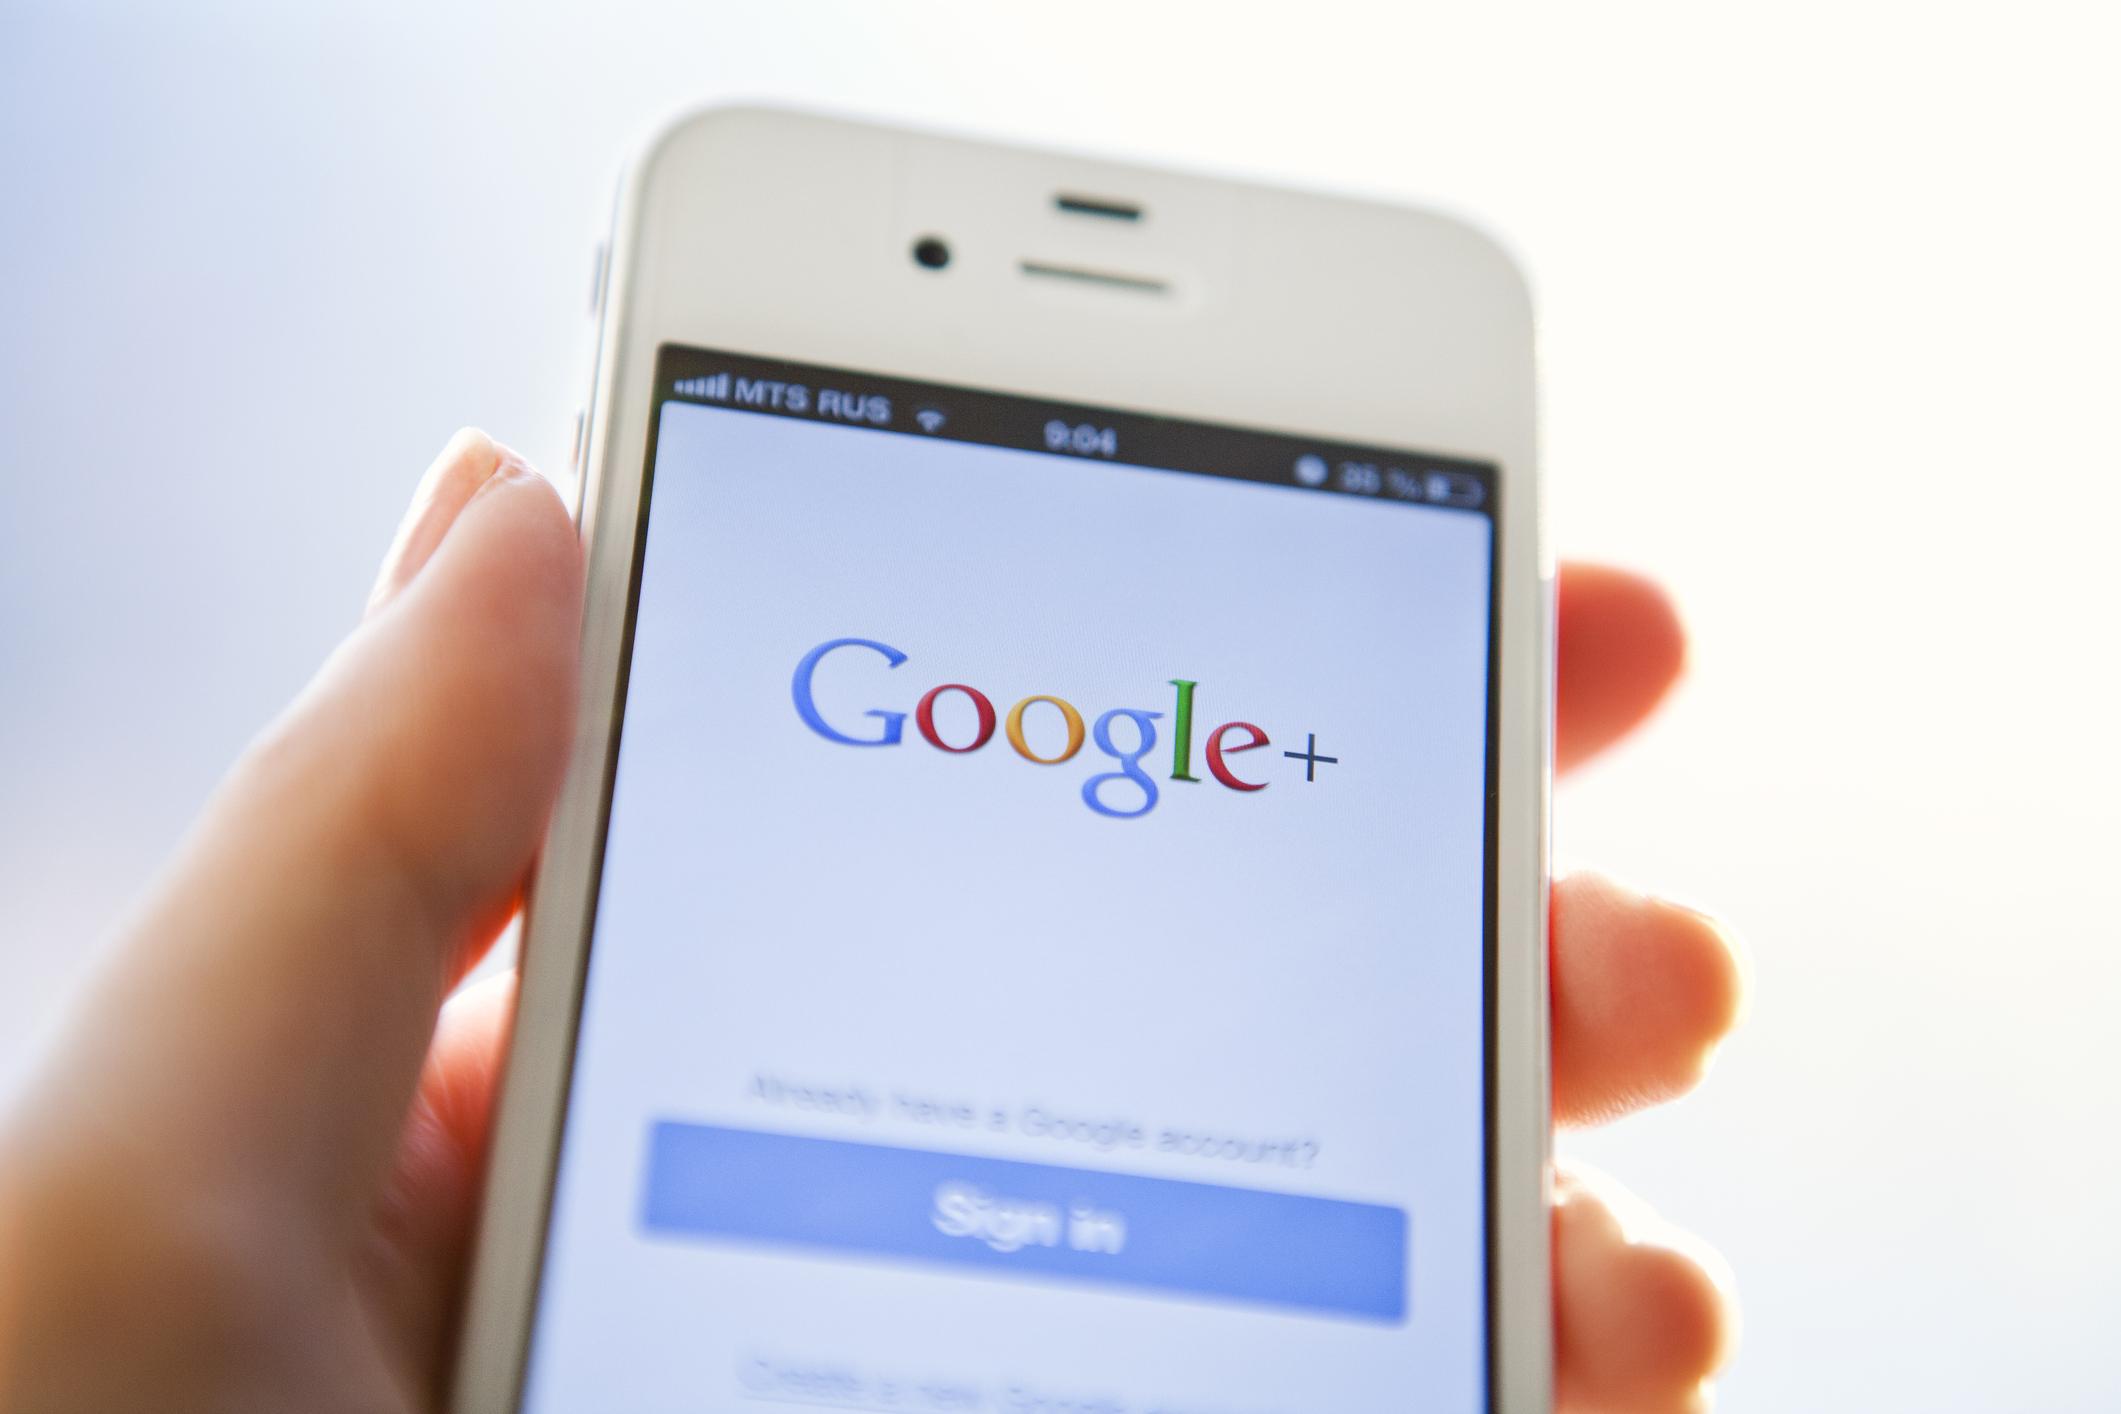 Google Plus on iPhone